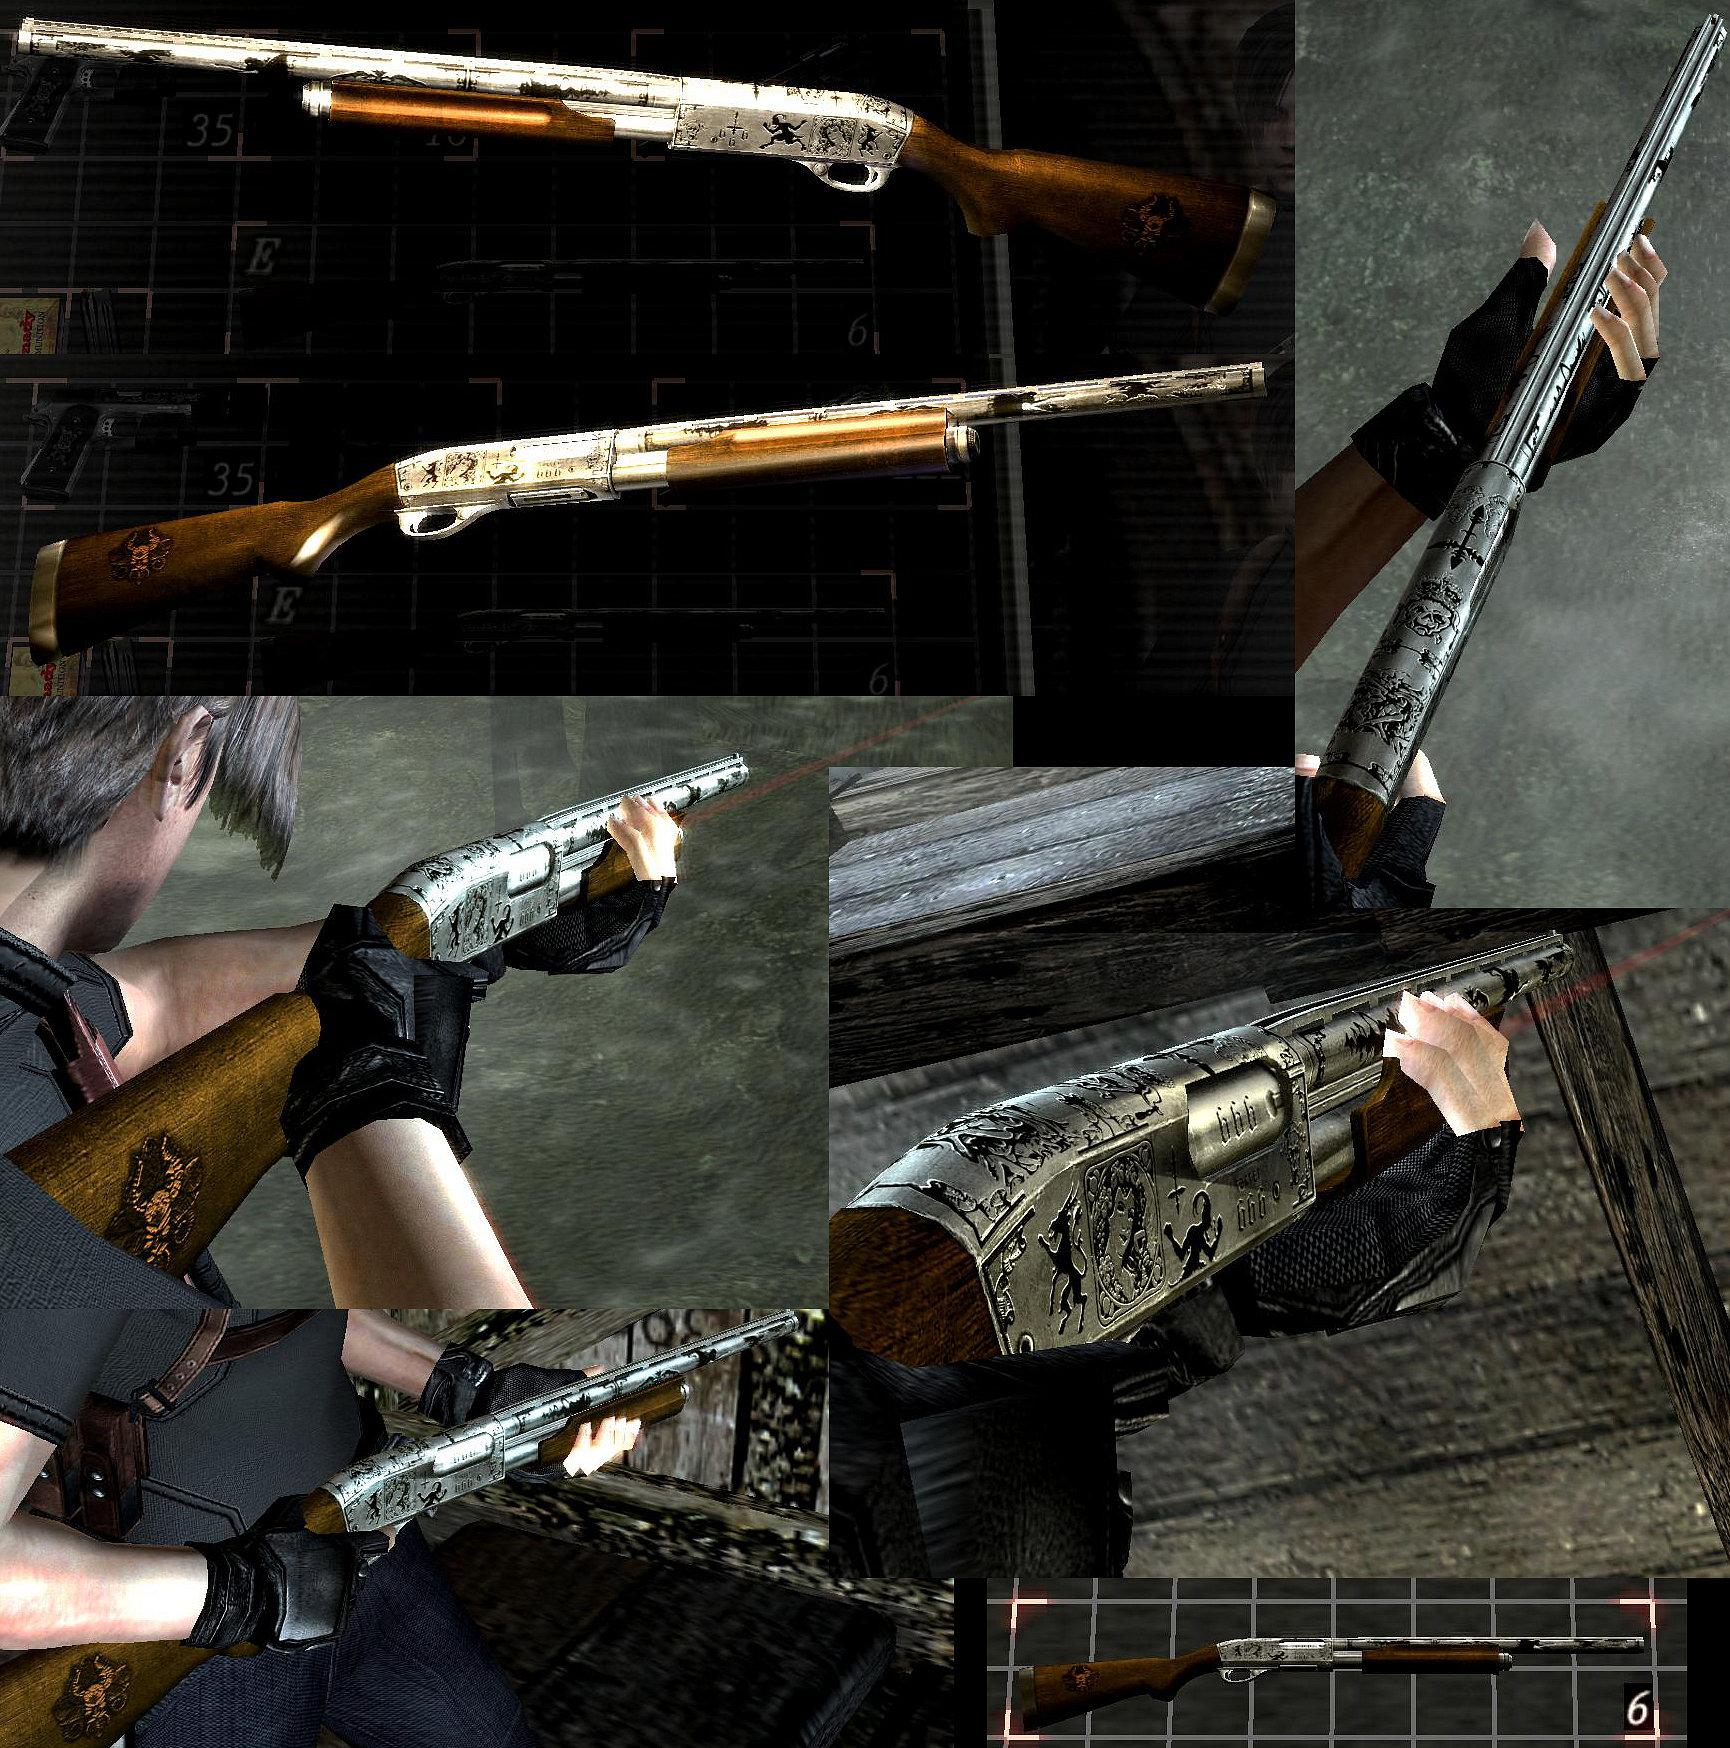 Skins / Armas / HD/ Resident Evil 4 / Autor / Cerberus / Parte 2 C4af51d113800717364f03acfc46aa9ao